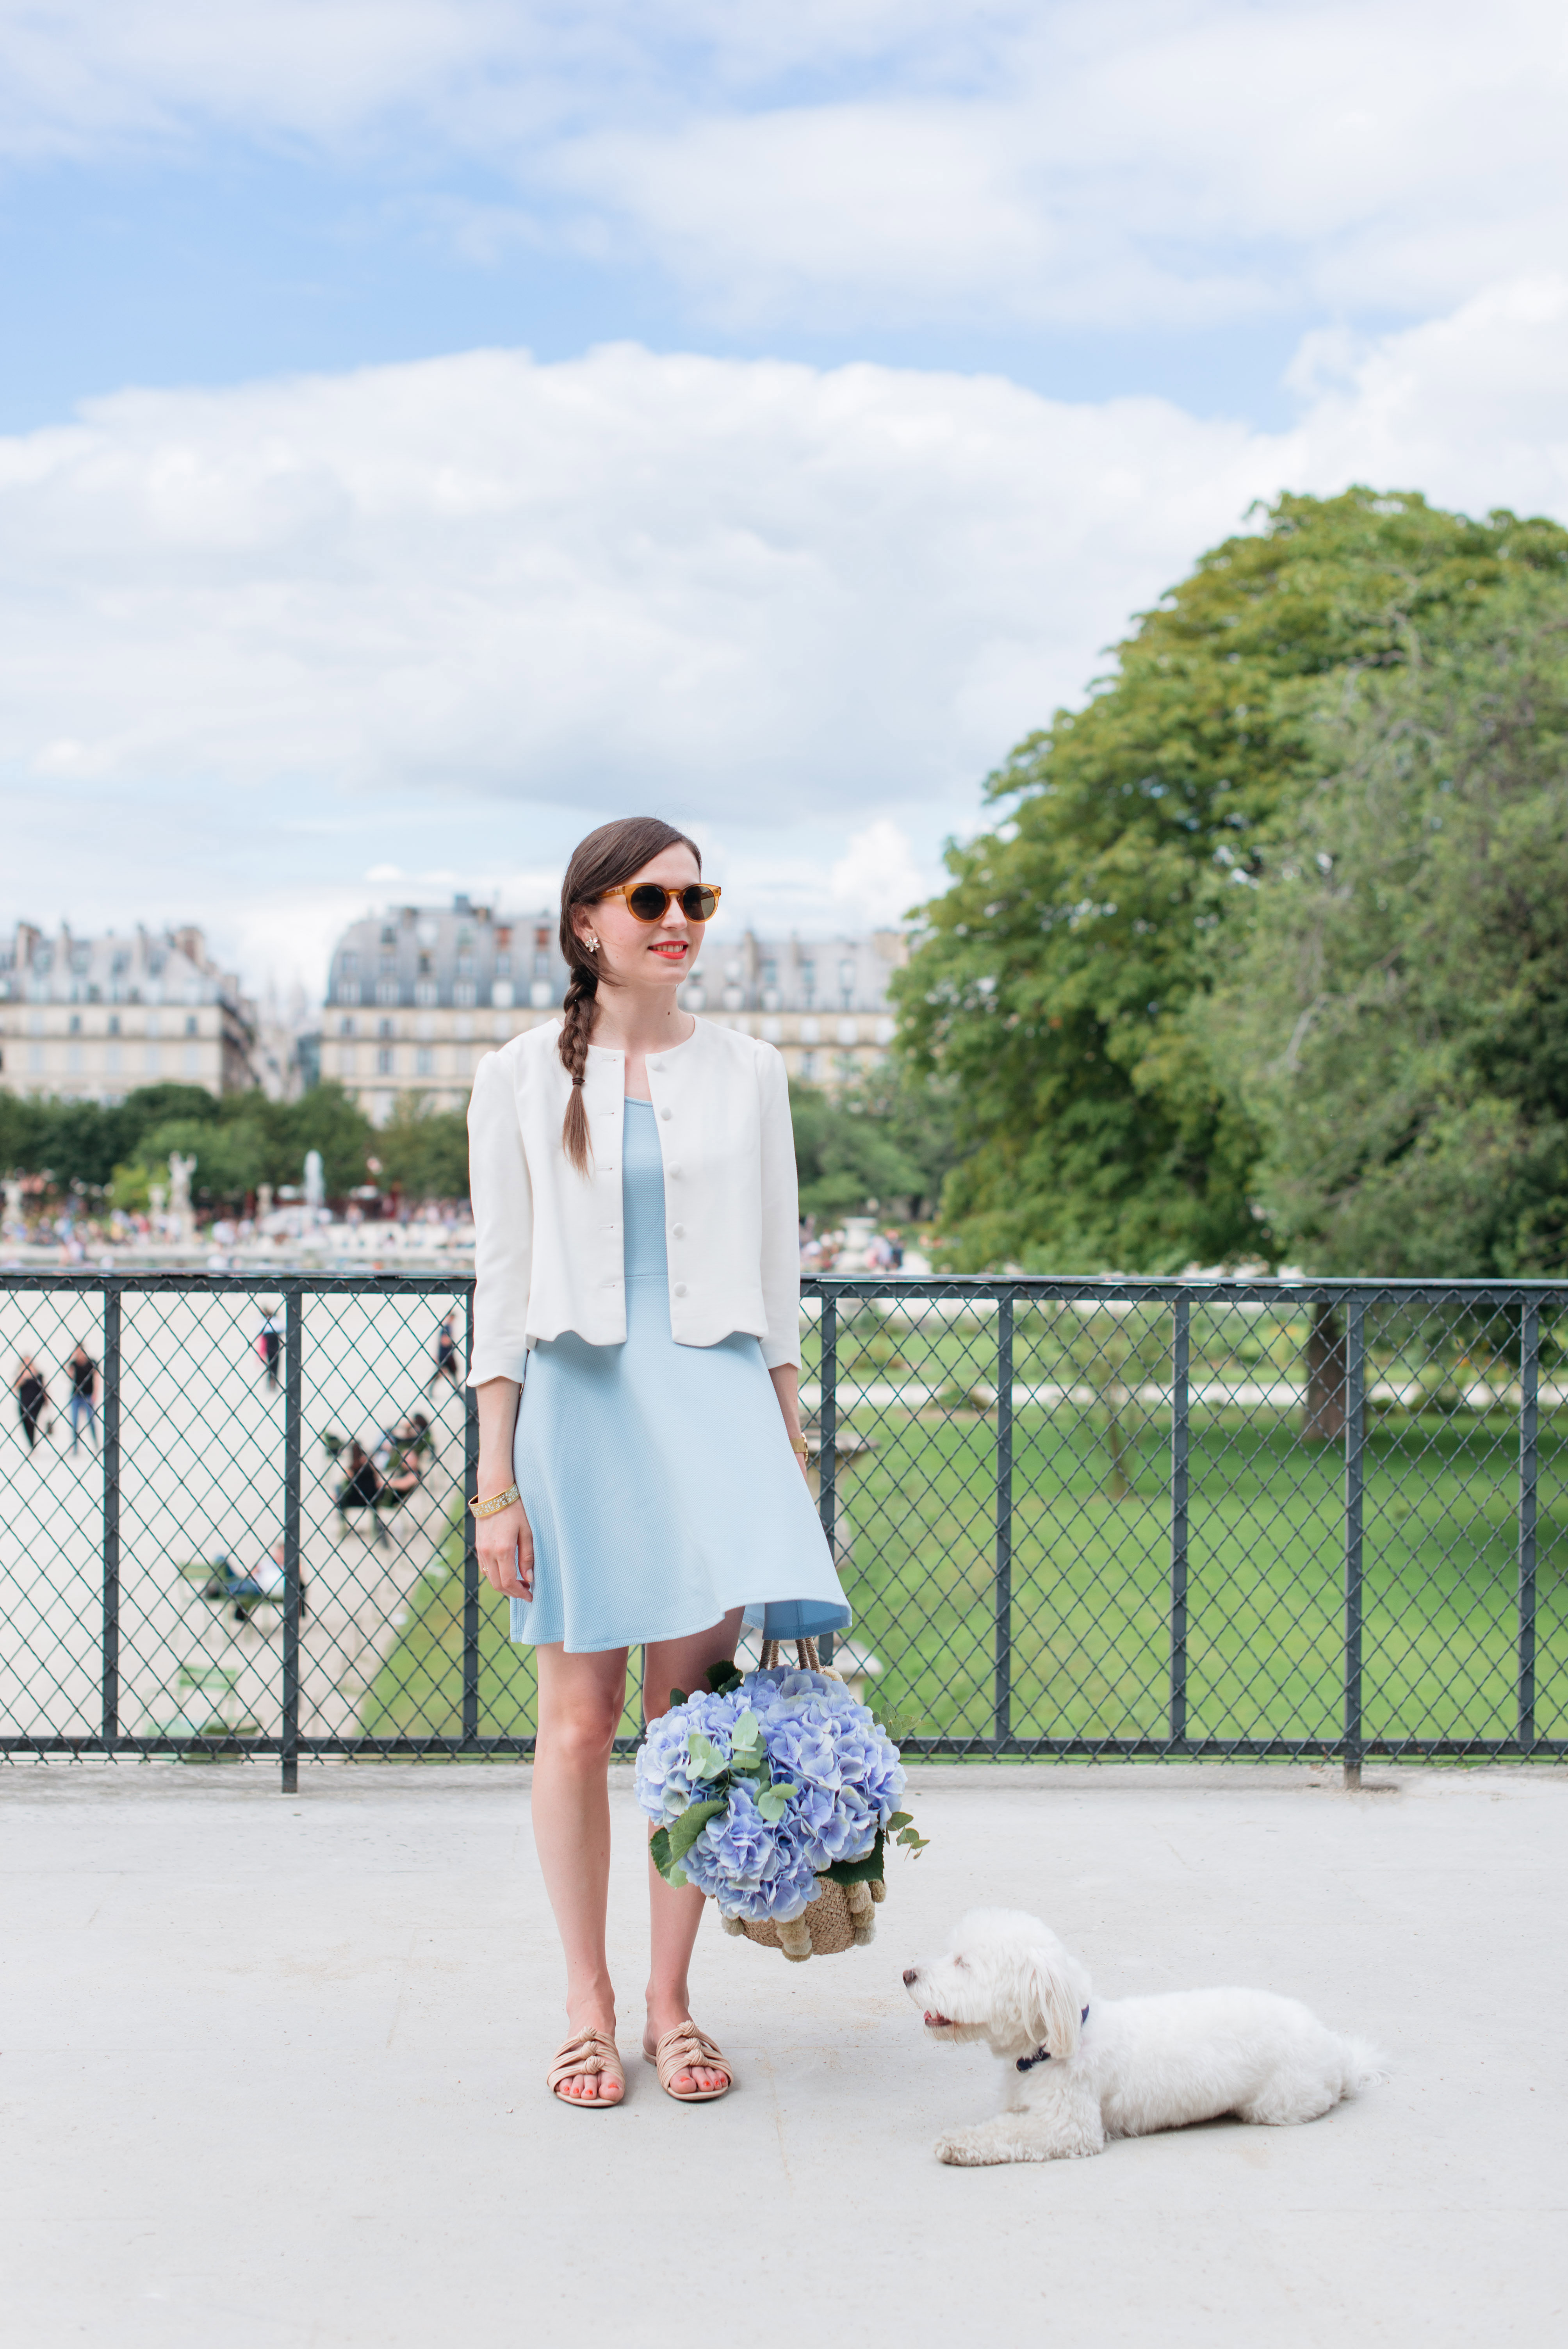 Blog-Mode-And-The-City-Looks-Robe-koshka-mashka-mistralee-10